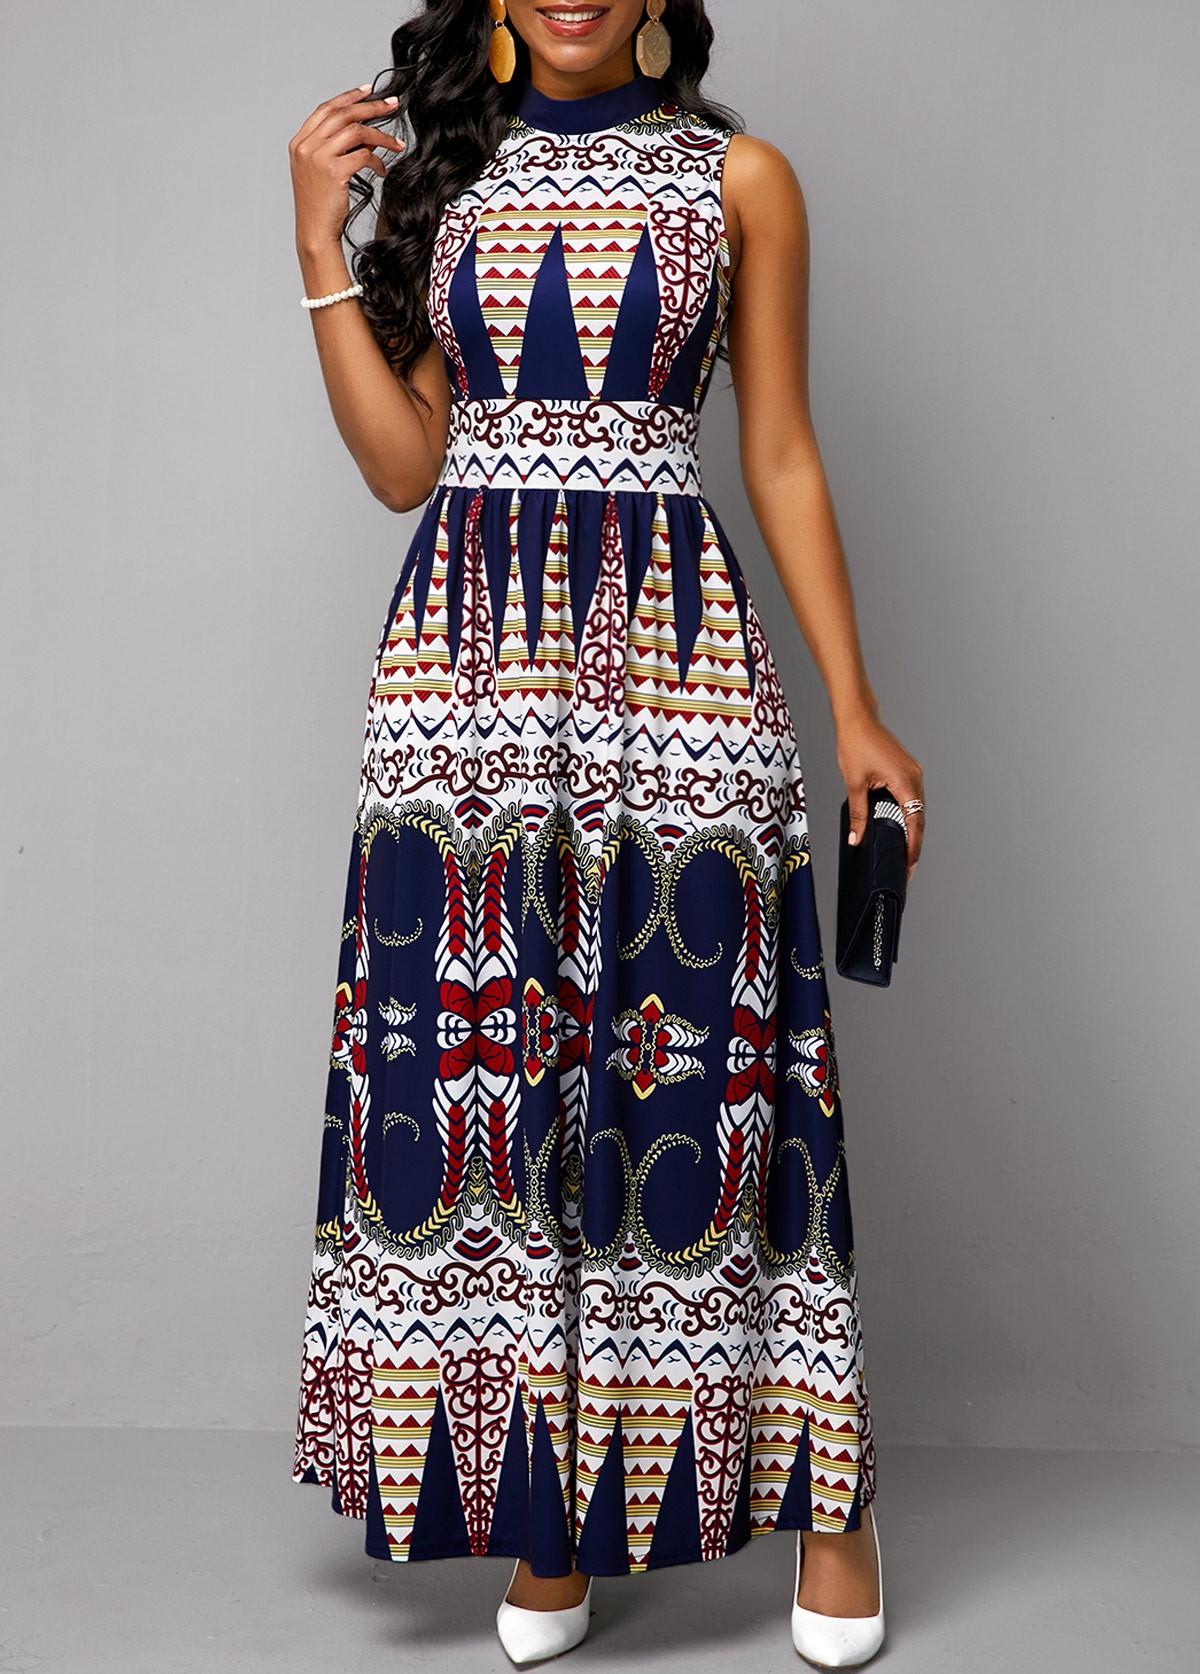 Mock Neck Tribal Print Sleeveless Dress